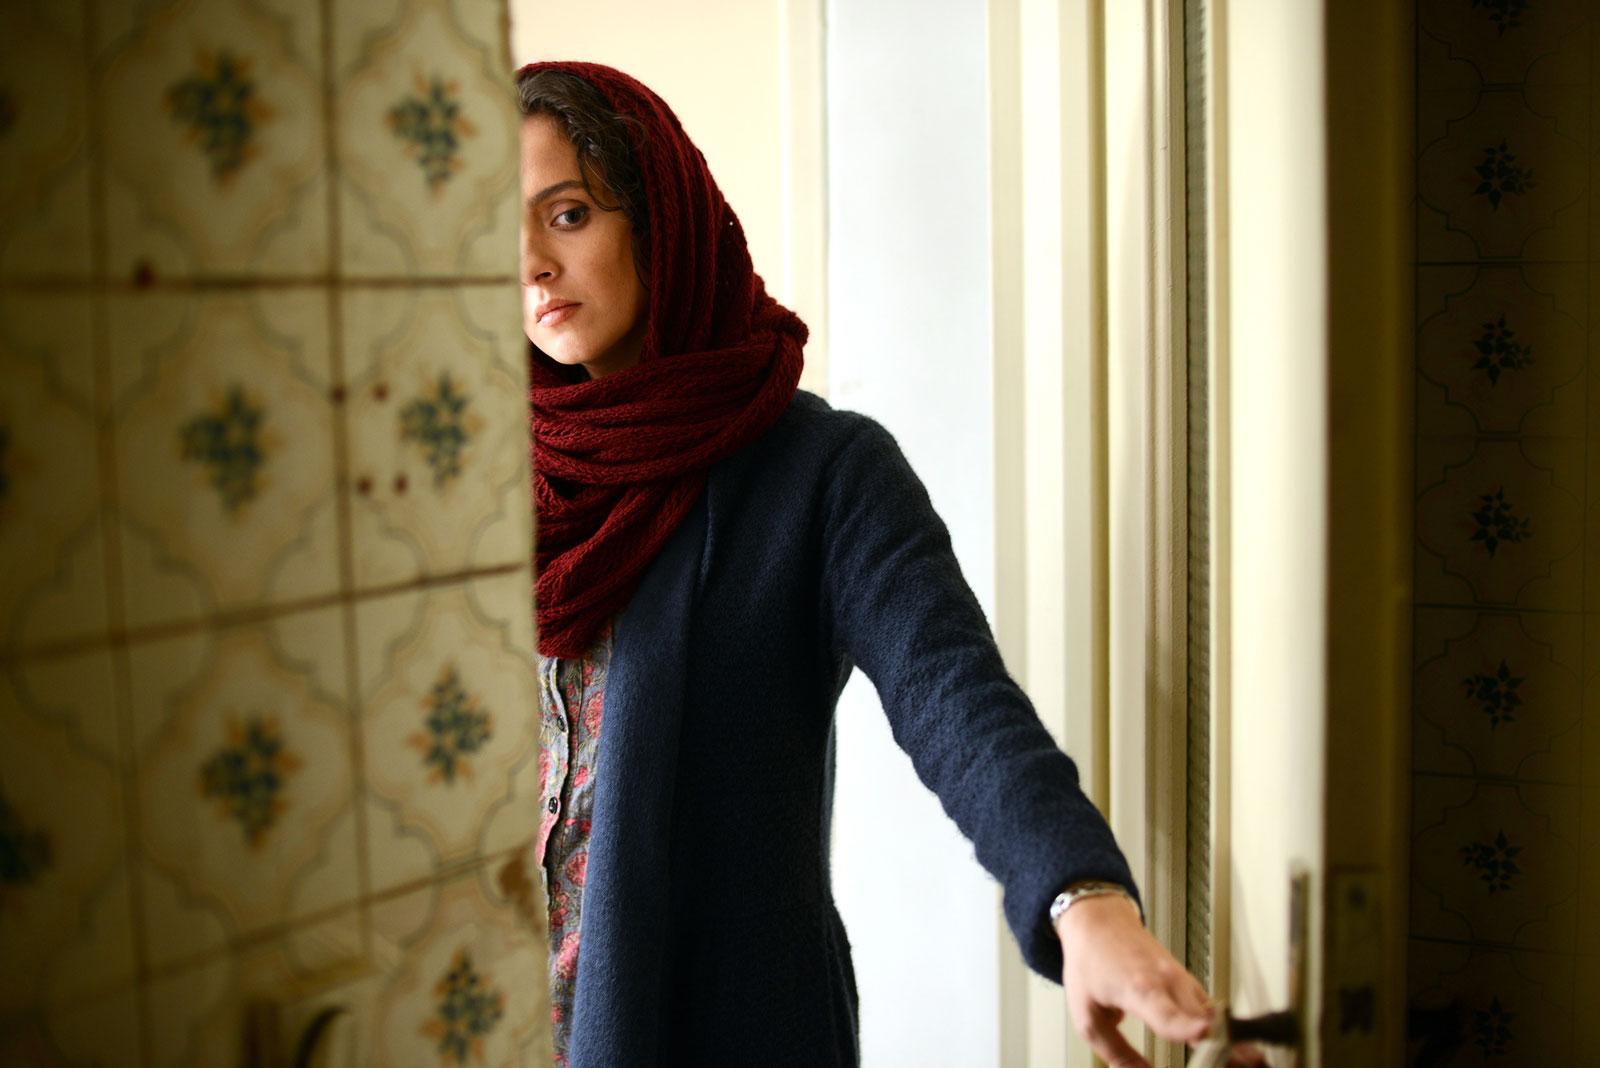 Taraneh Alidoosti as Rana in Asghar Farhadi's The Salesman, 2016